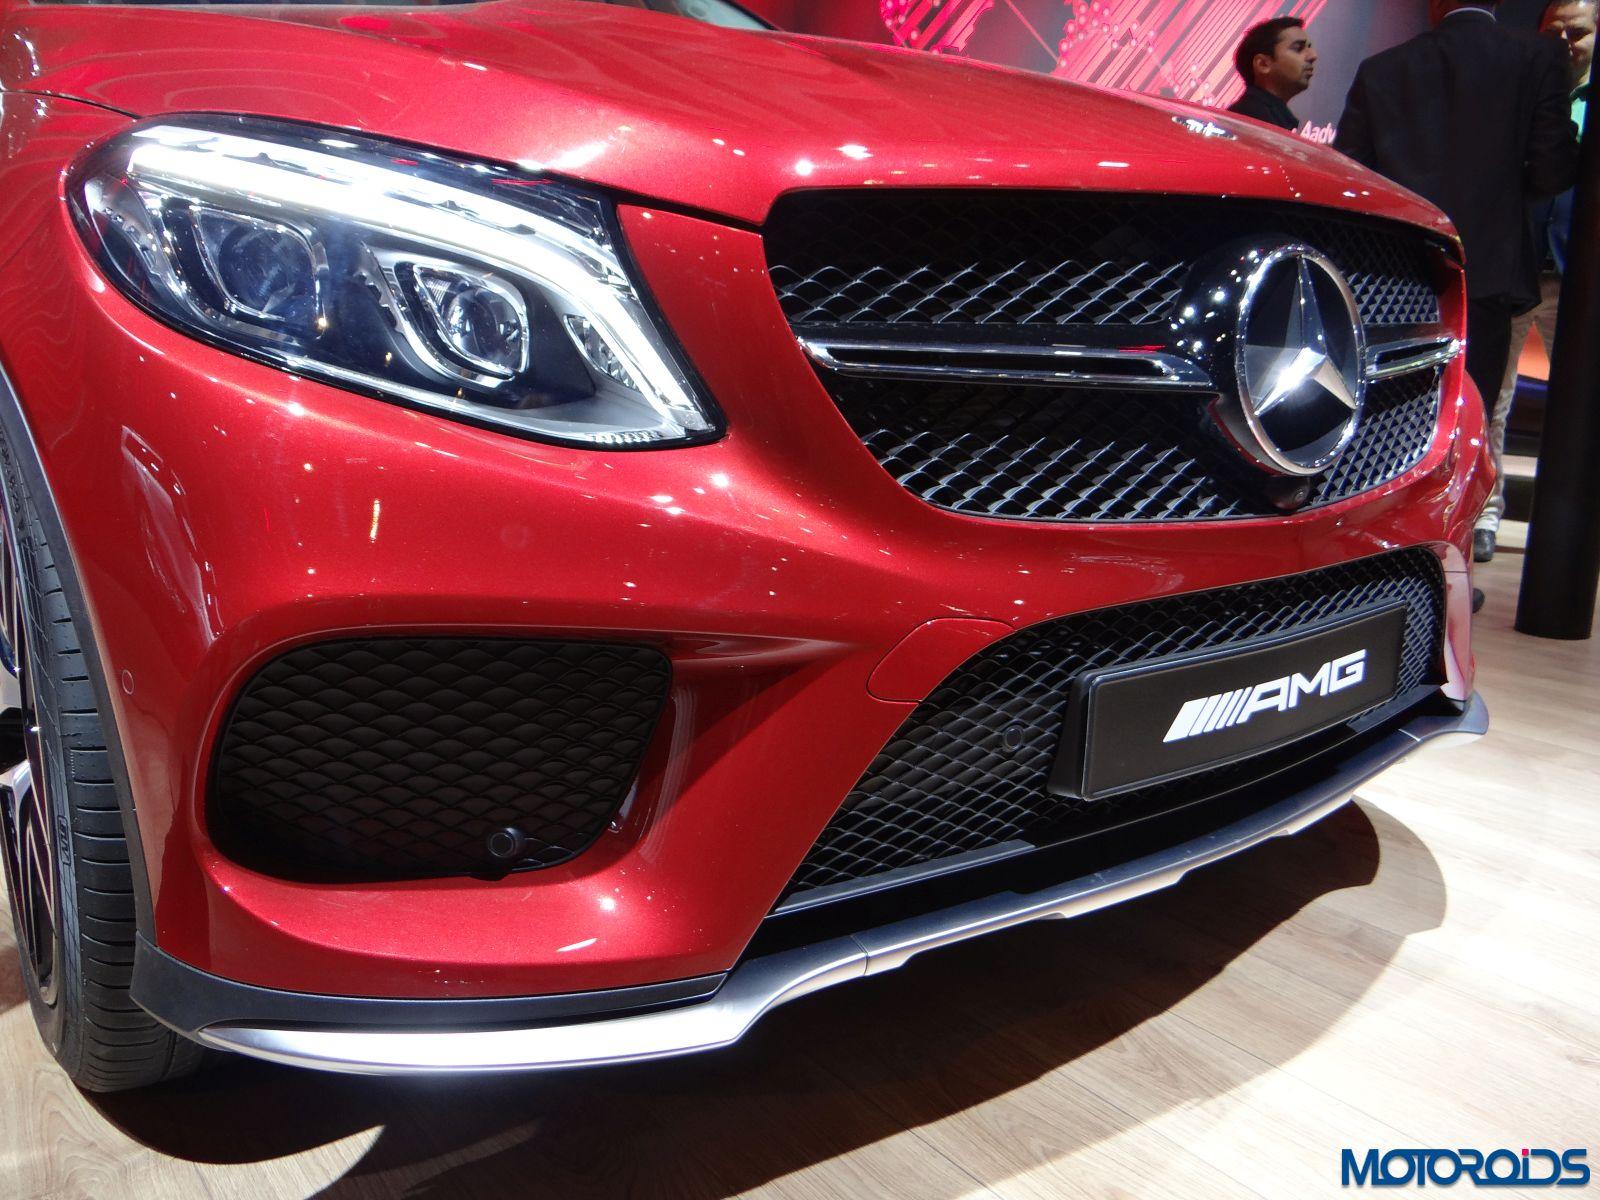 Mercedes Cars At Auto Expo 2016 Mercedes Benz At Delhi: Auto Expo 2016: Mercedes Benz Showcases The AMG GT, GLE